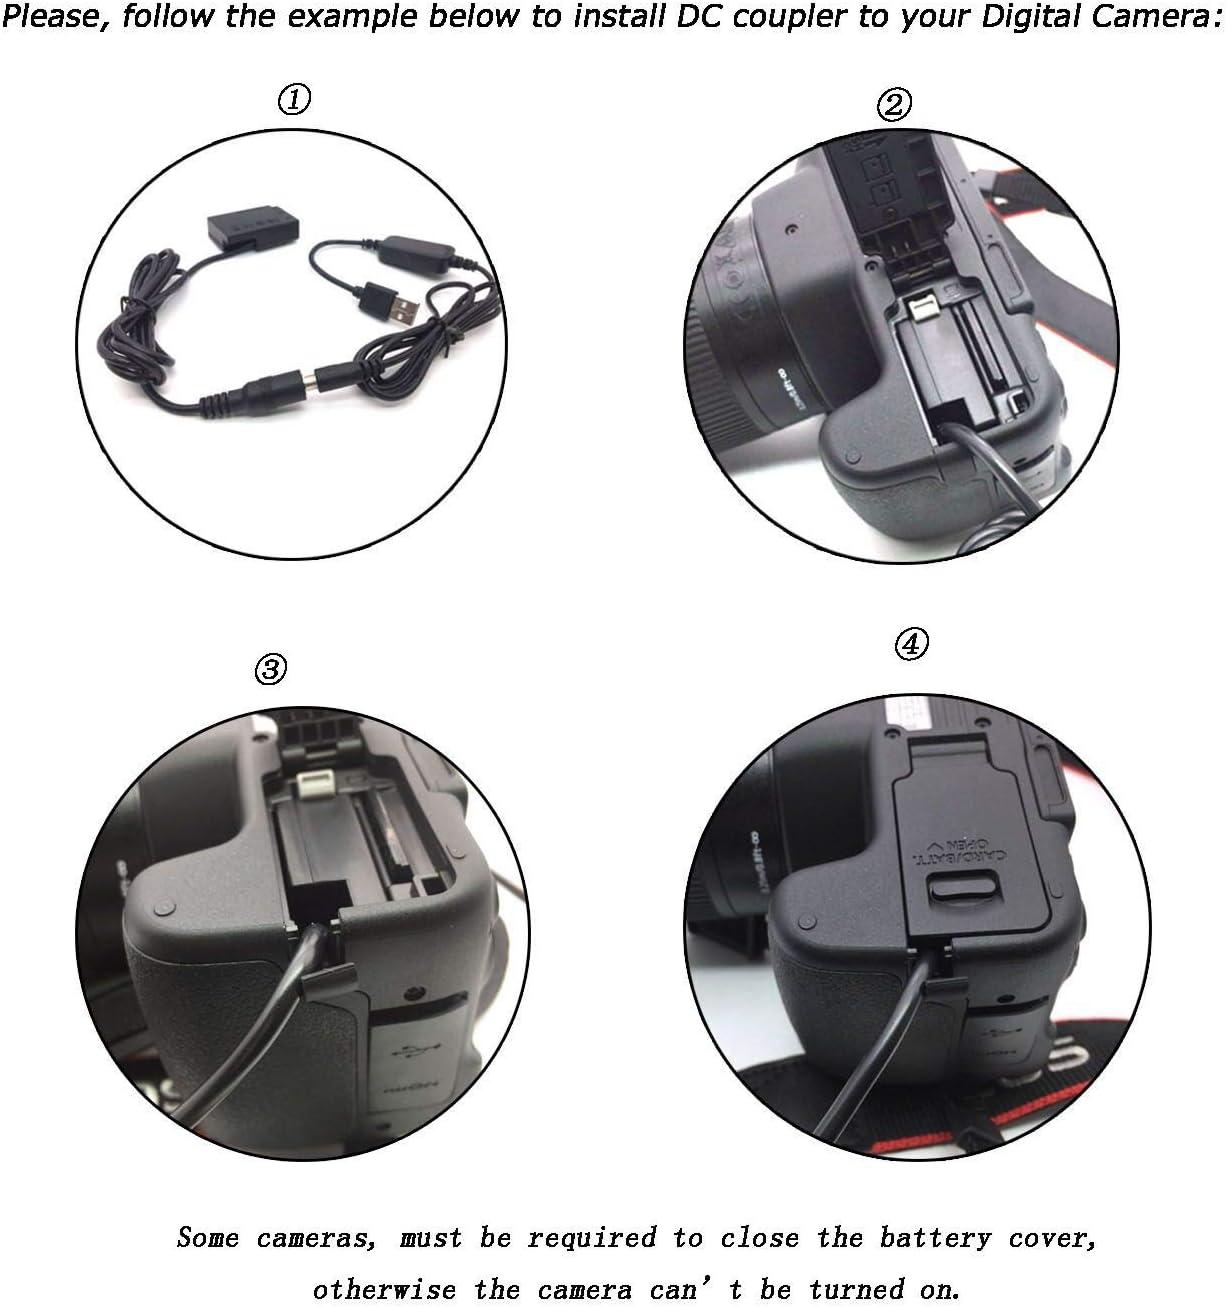 Adapter for Lumix DMC-GH3 DMC-GH4 DMC-GH5 Mobile Power USB Charger Cable DMW-DCC12 DMW BLF19E BLF19 Dummy Battery